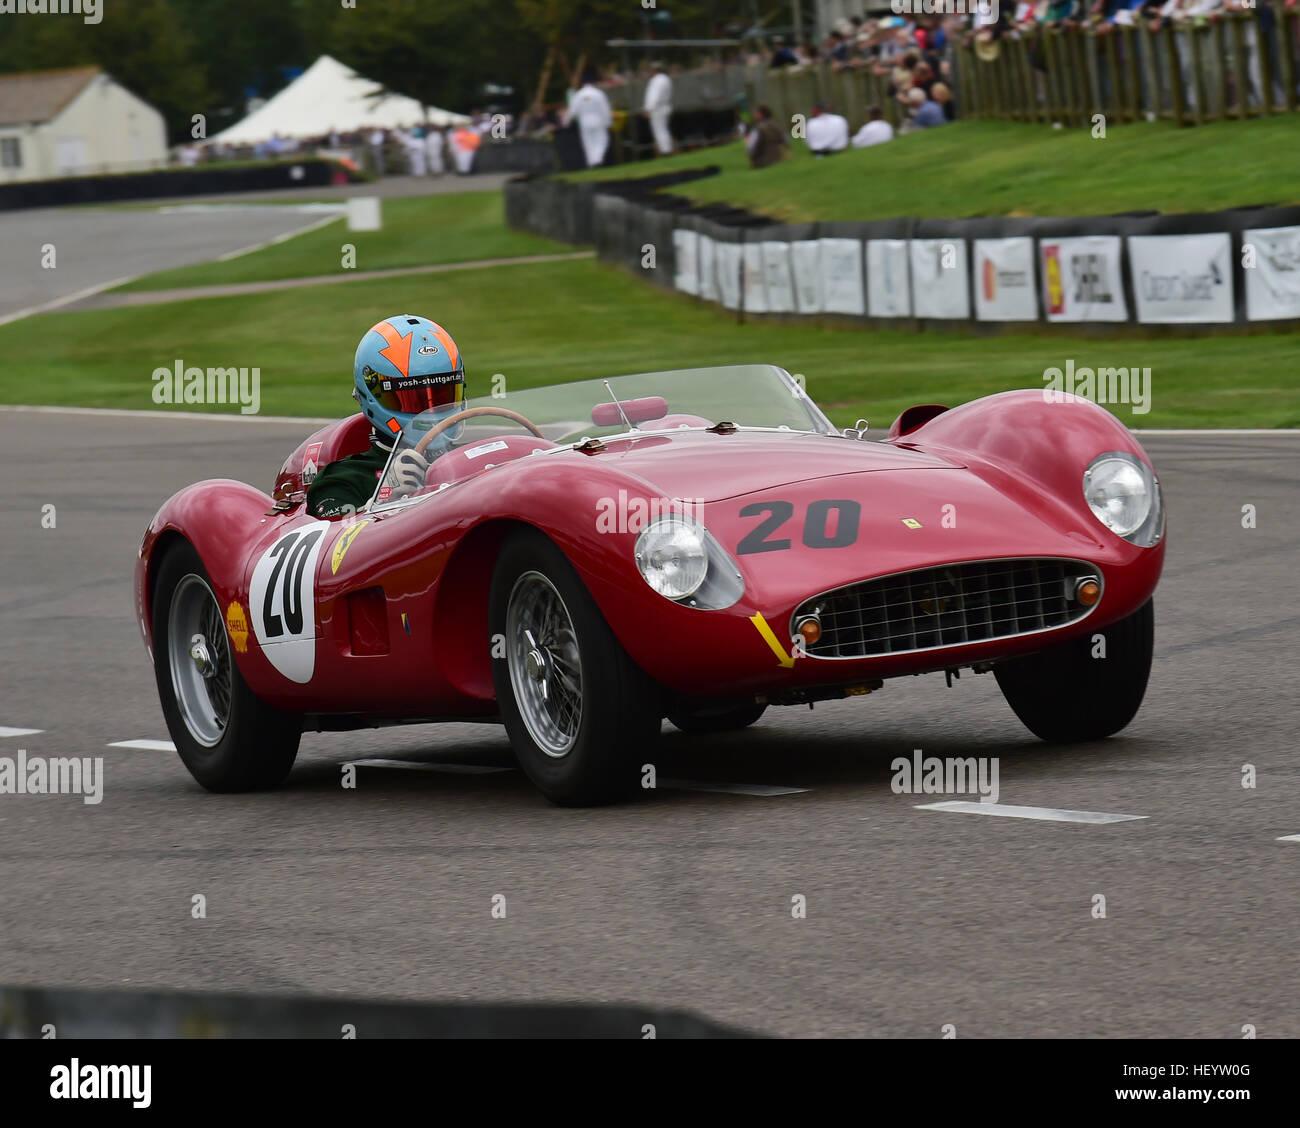 Christoph, Rendlen, Ferrari 500, Freddie März Memorial Trophy, Sports Racing Cars, Goodwood Revival 2016, 2016, Stockbild